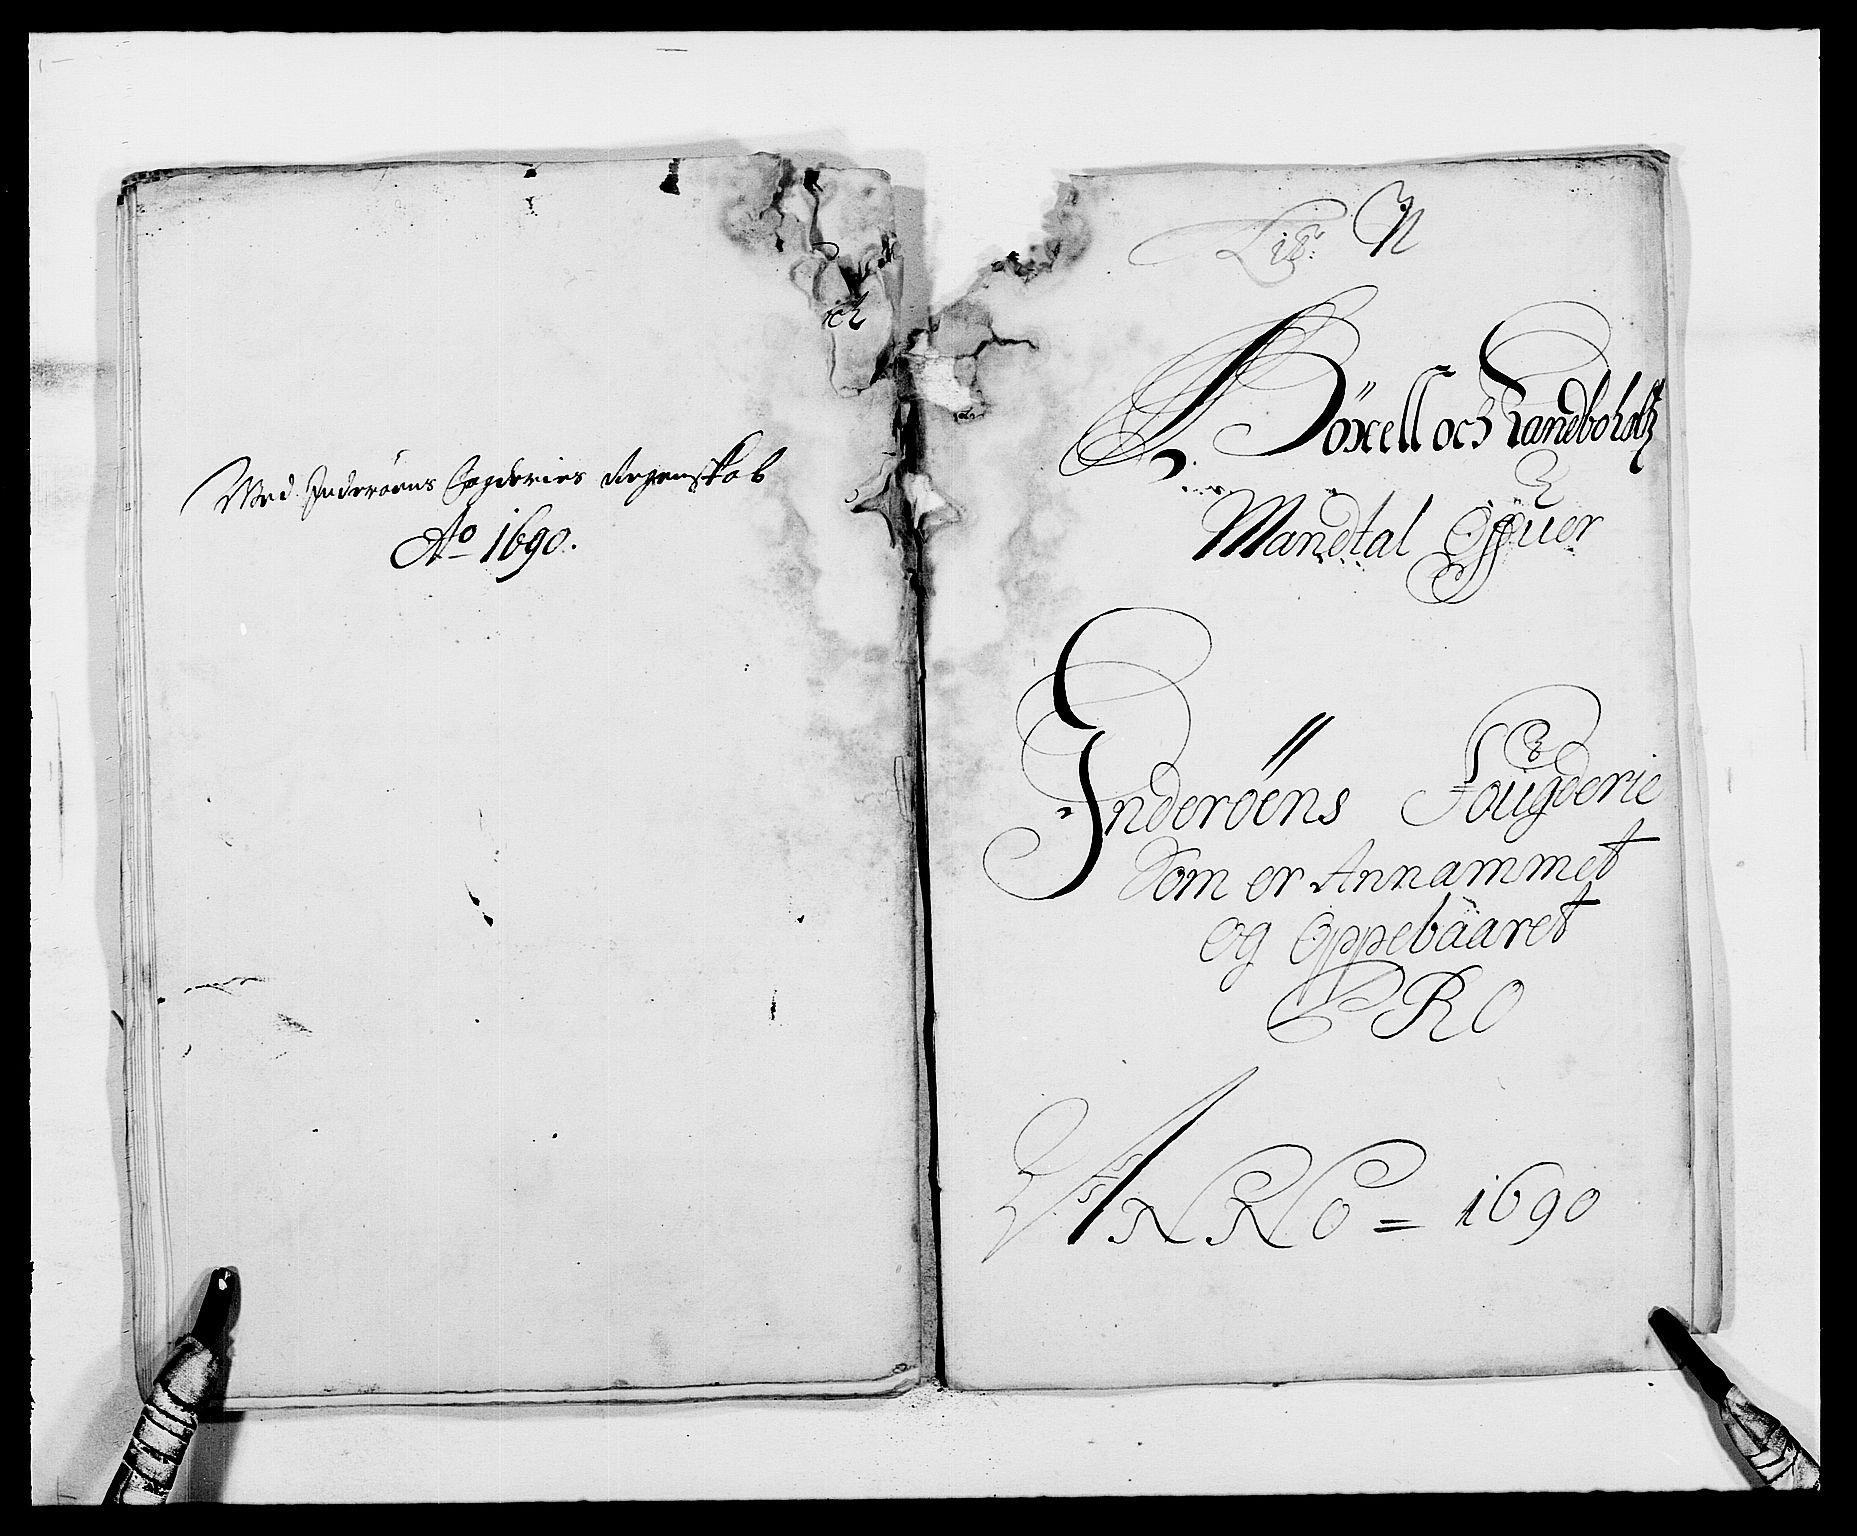 RA, Rentekammeret inntil 1814, Reviderte regnskaper, Fogderegnskap, R63/L4307: Fogderegnskap Inderøy, 1690-1691, s. 175